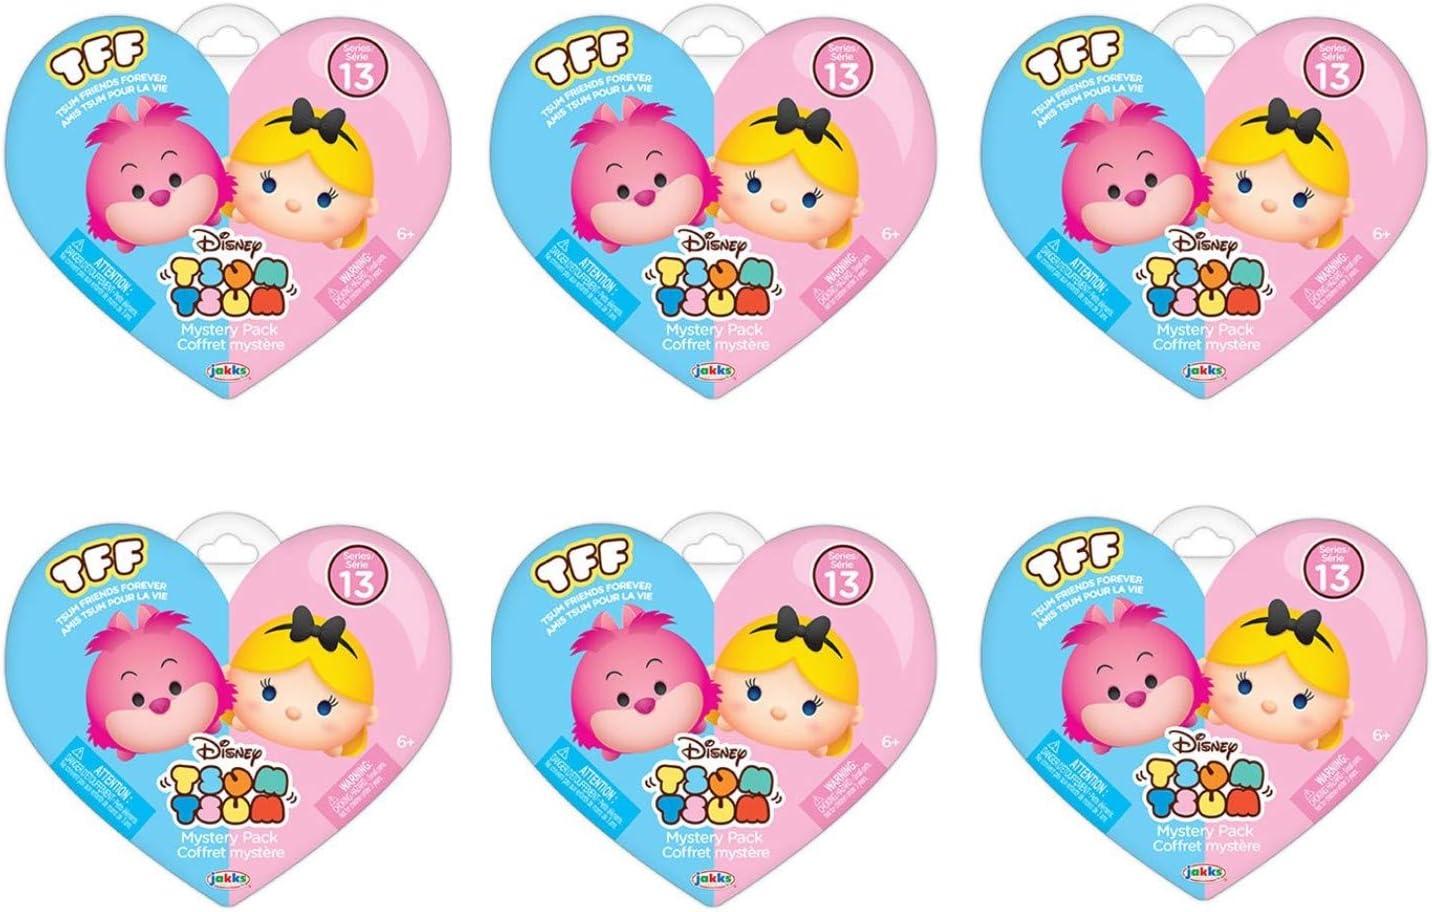 Disney Mystery Pack Mini Figures Series 11 Tsum Tsum Bundle of 6